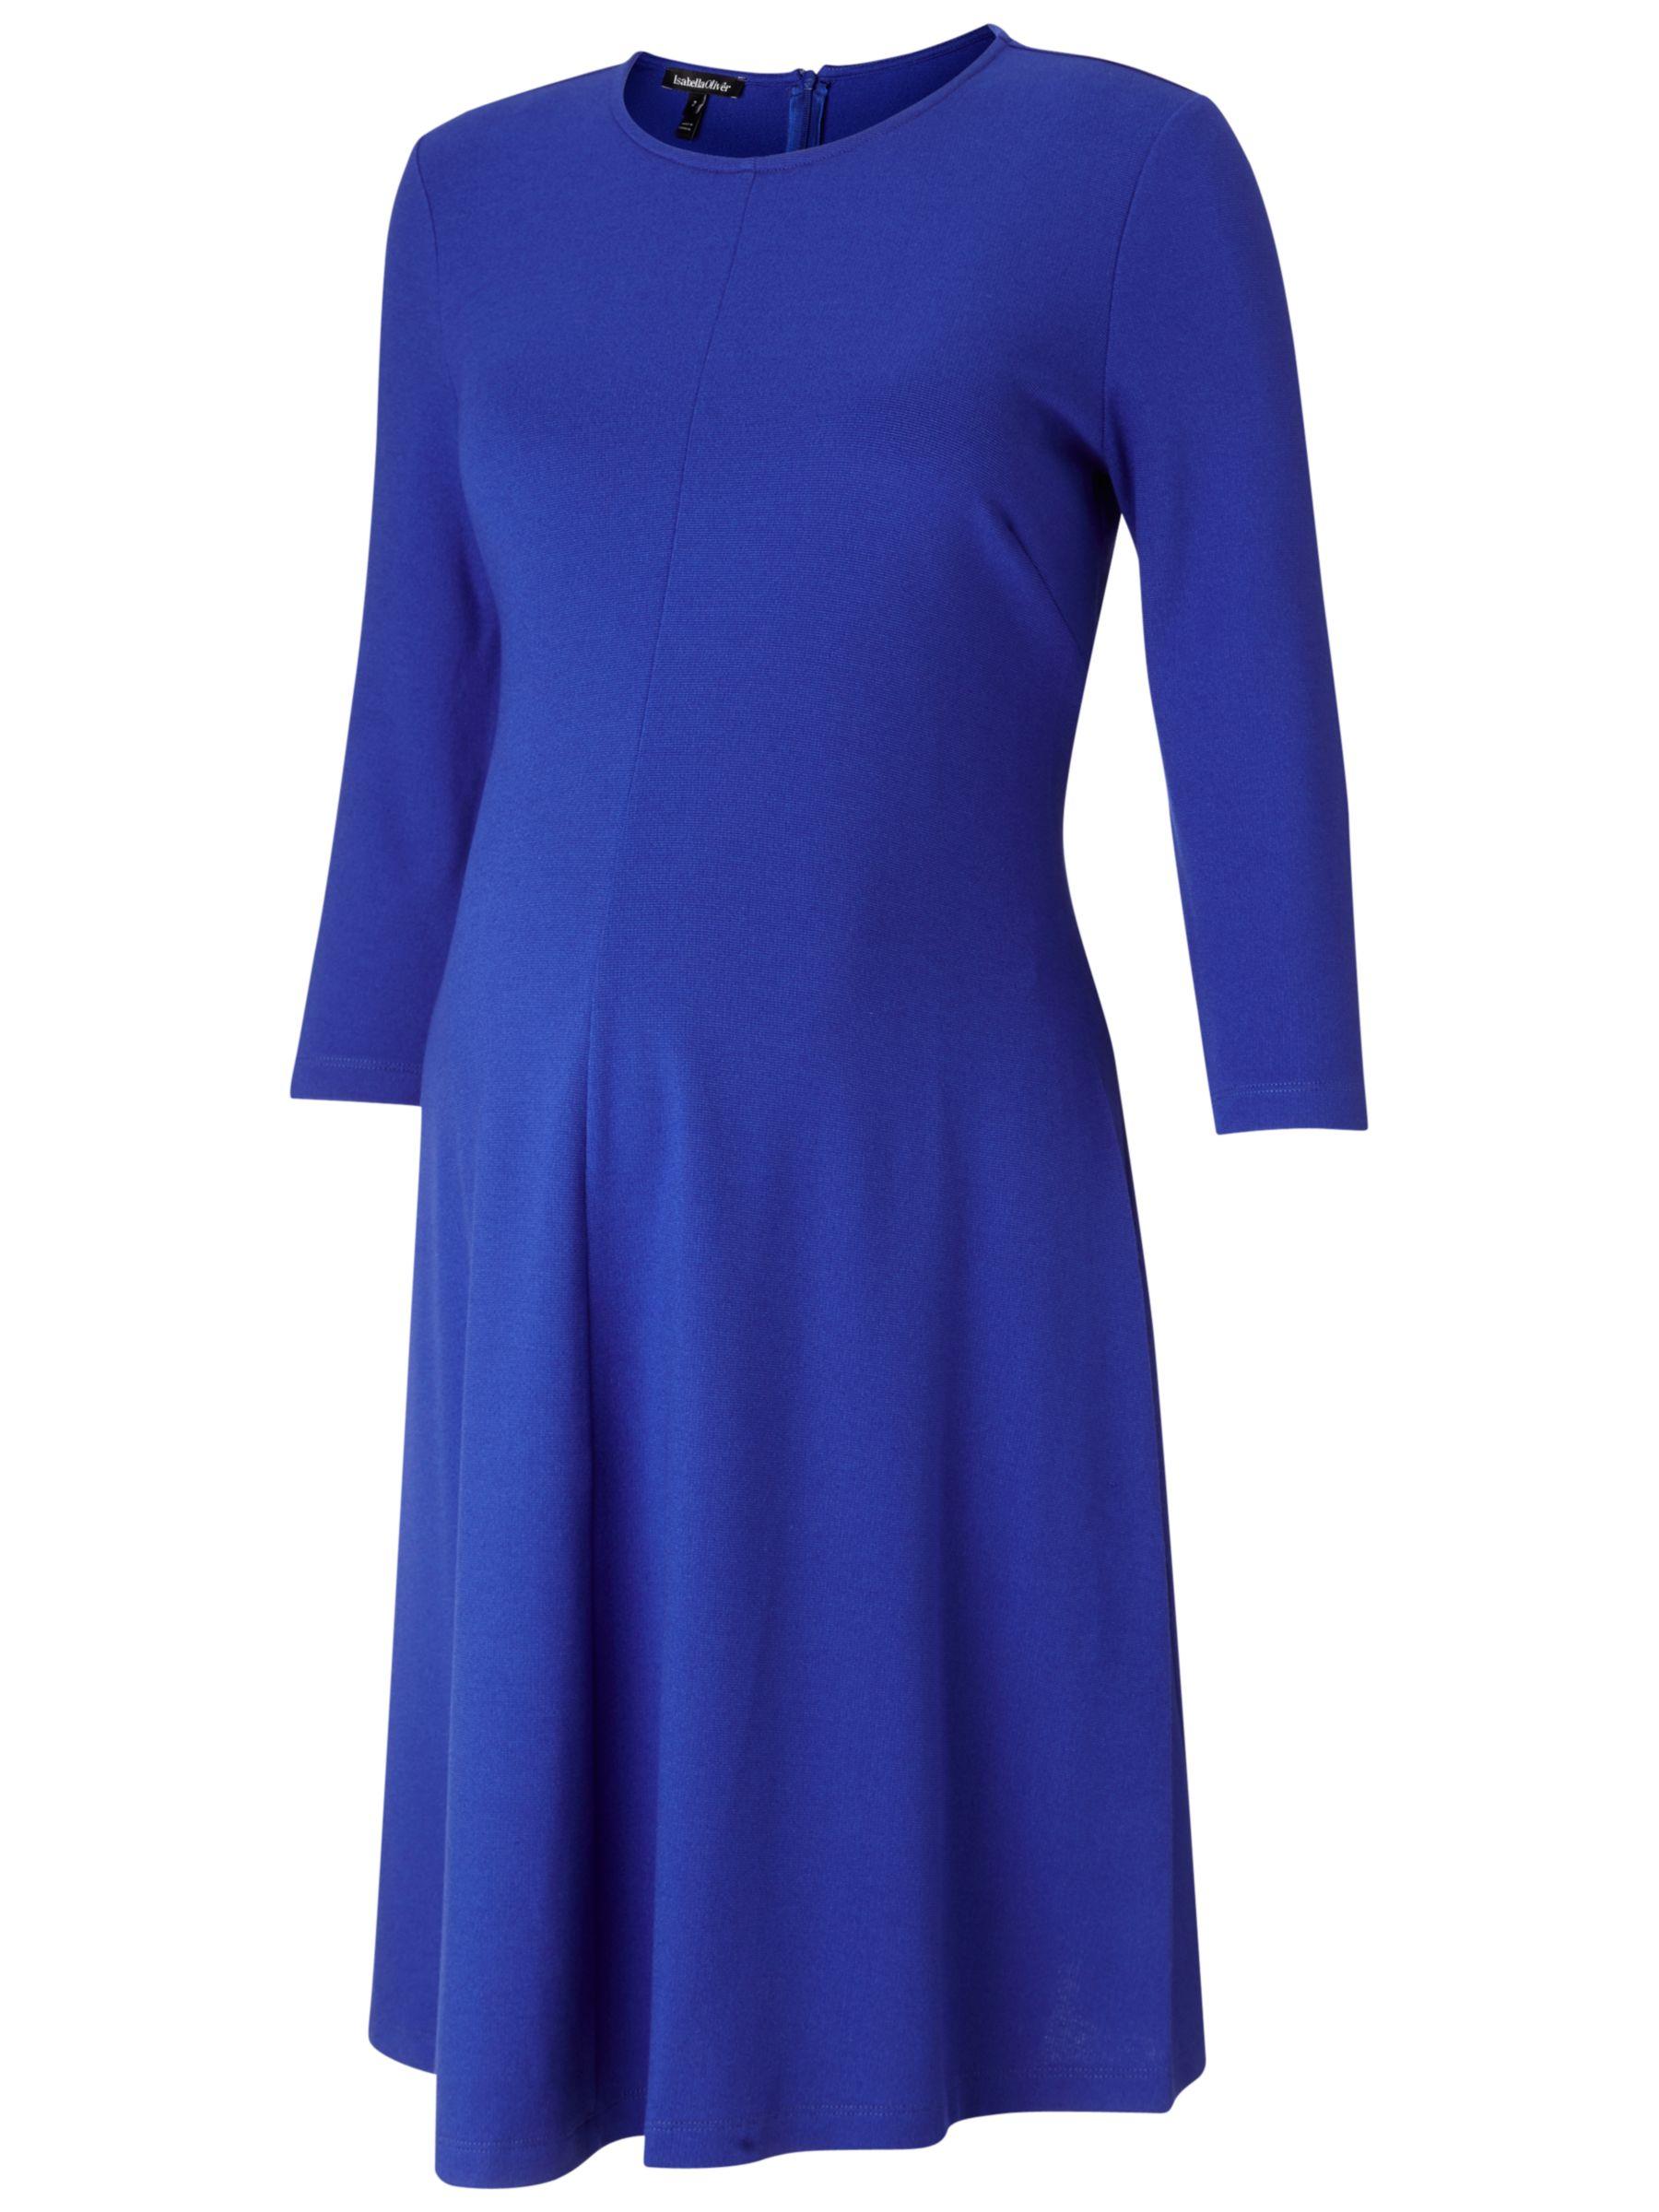 Isabella Oliver Isabella Oliver Bayswater Maternity Dress, Sapphire Blue